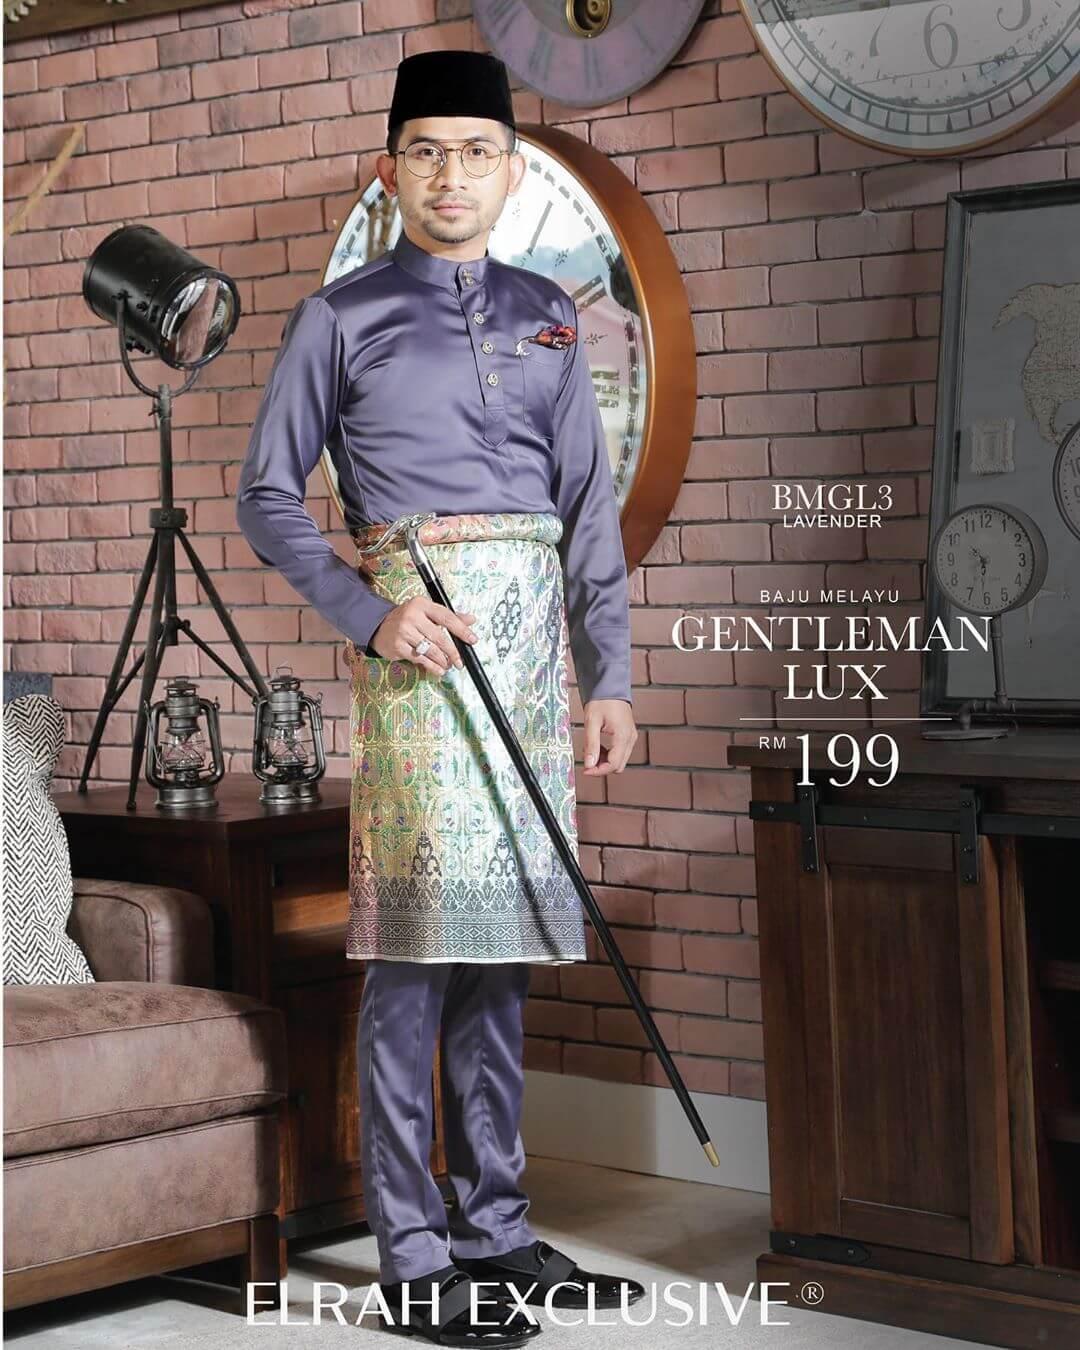 Baju Melayu Gentleman Lux Lavender